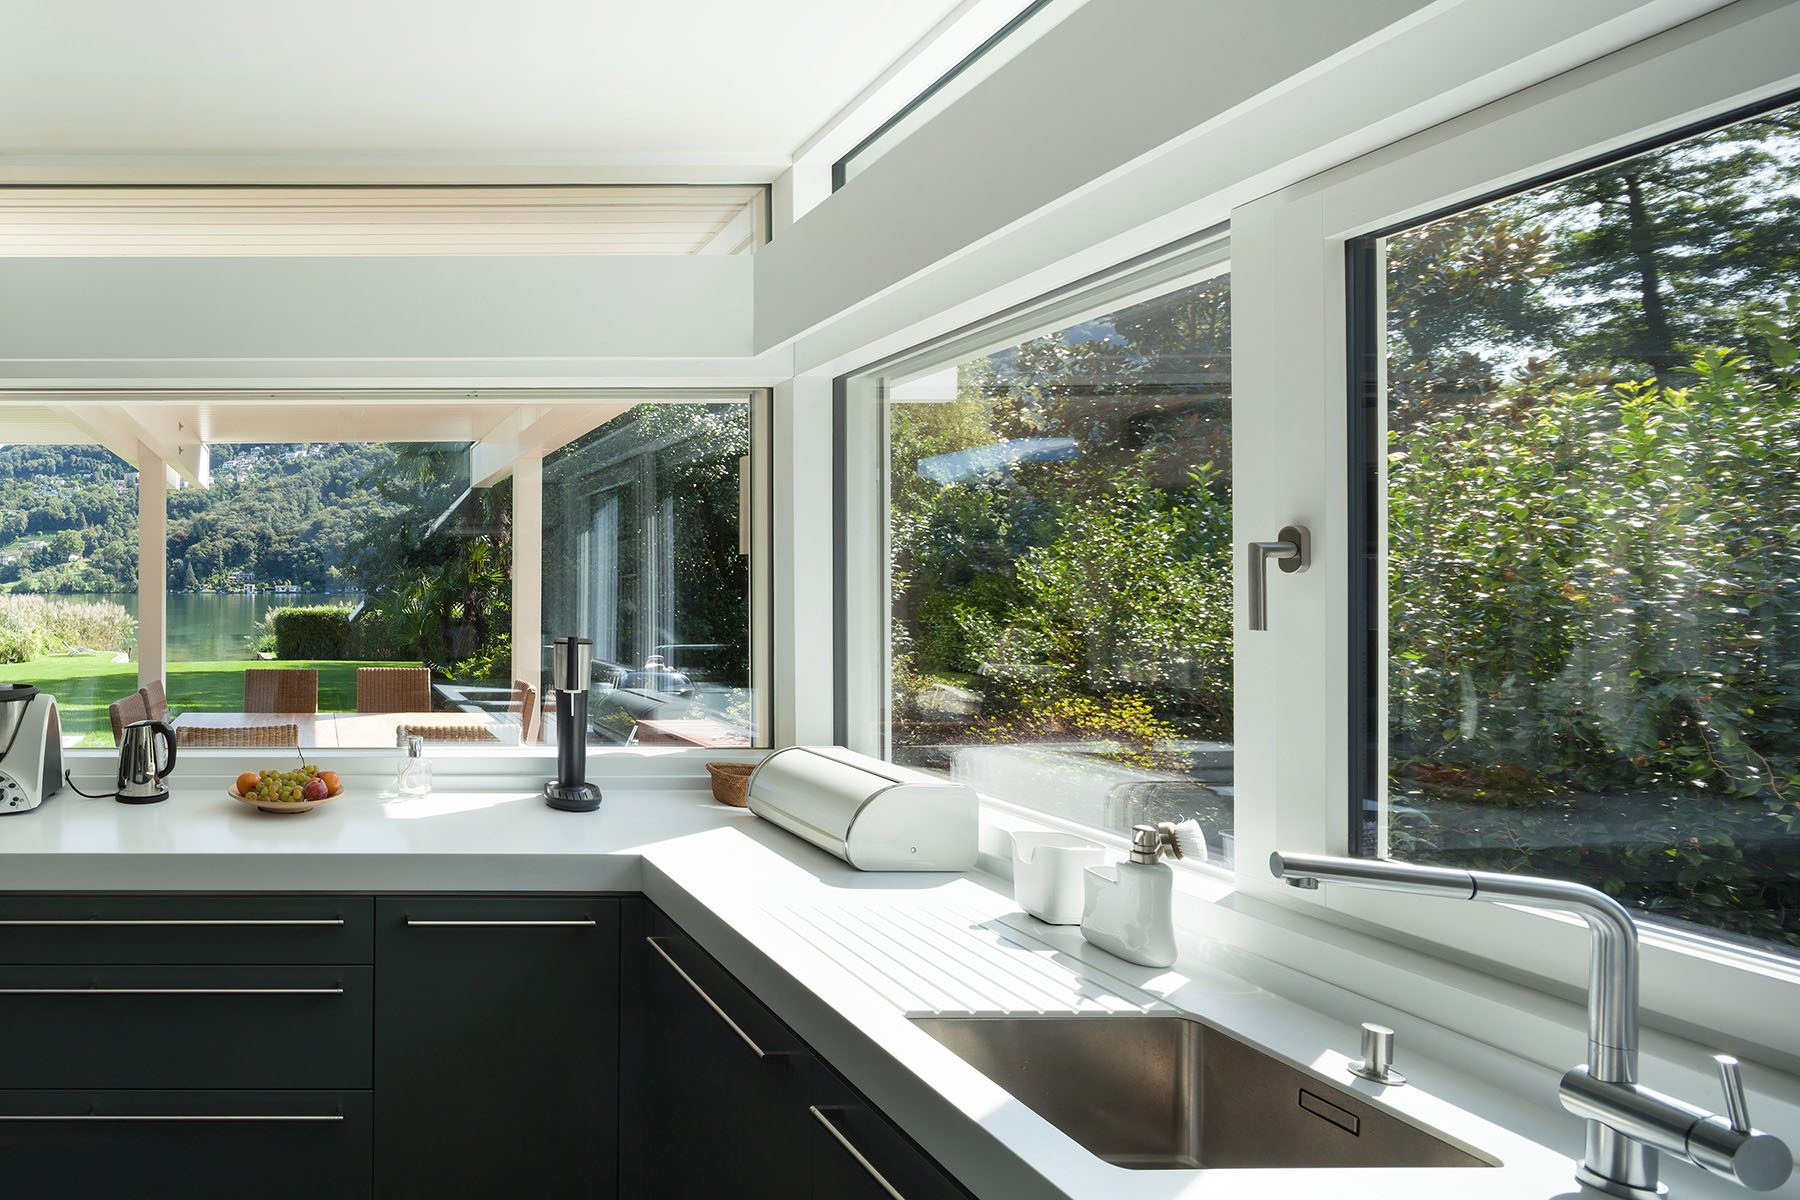 interior house, view of a modern kitchen